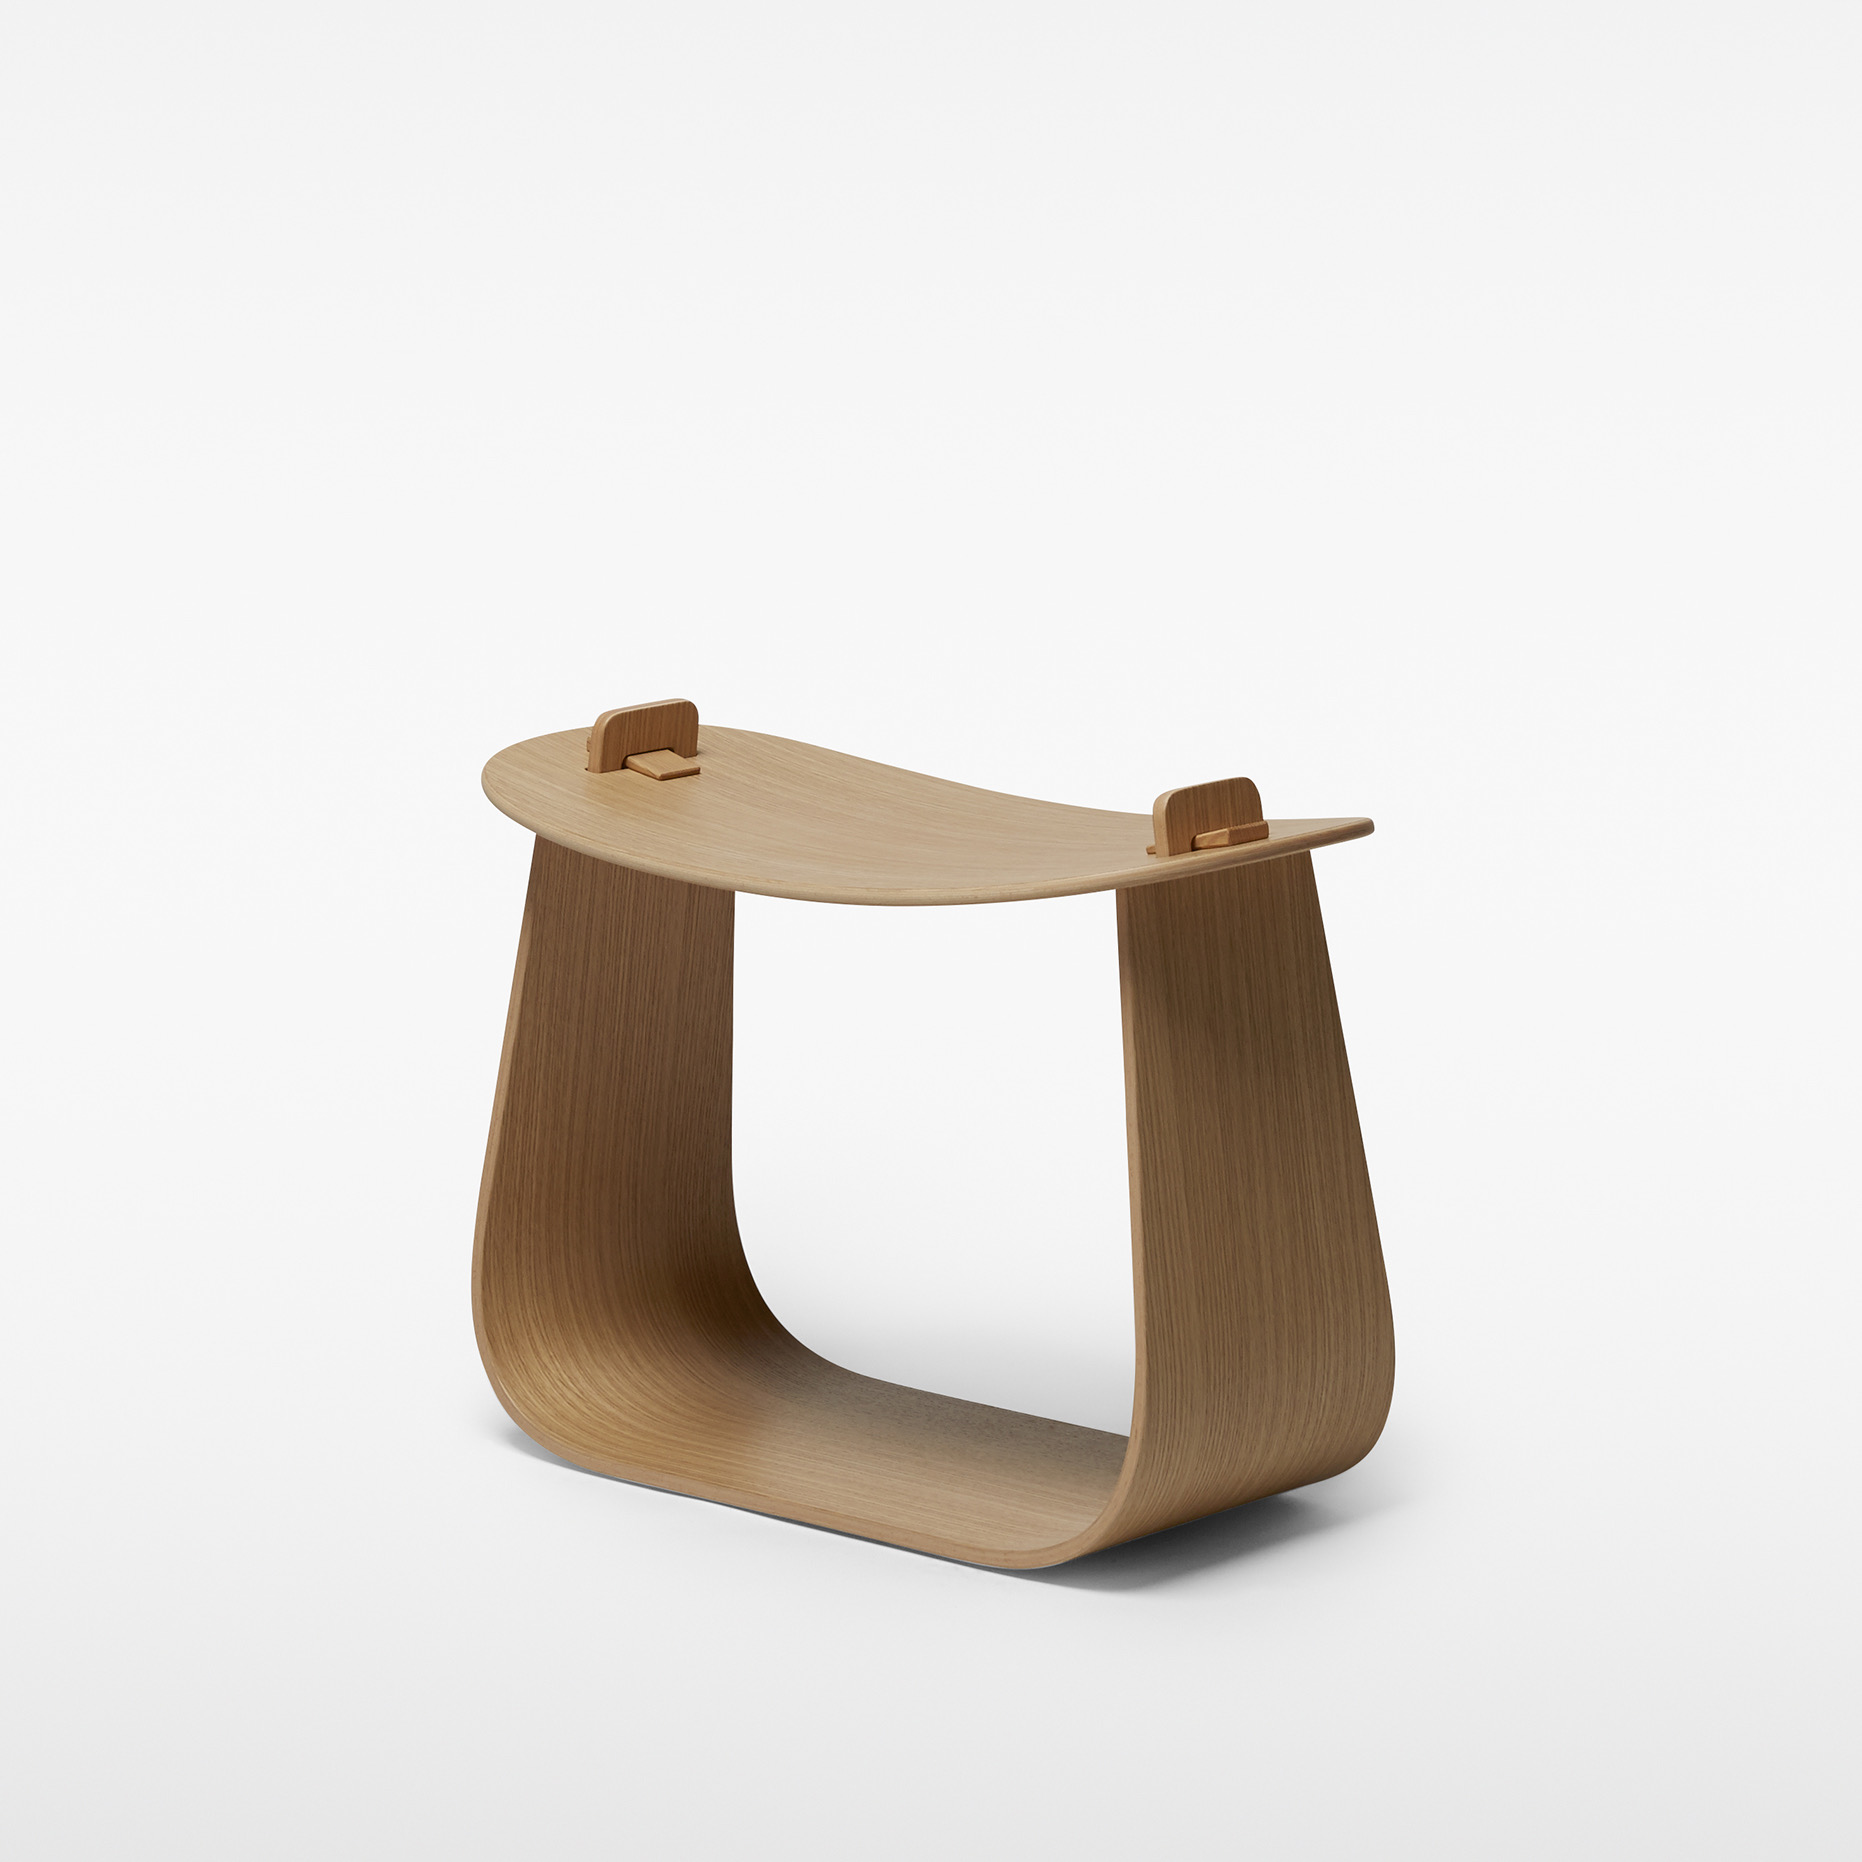 Massproductions Harry stool